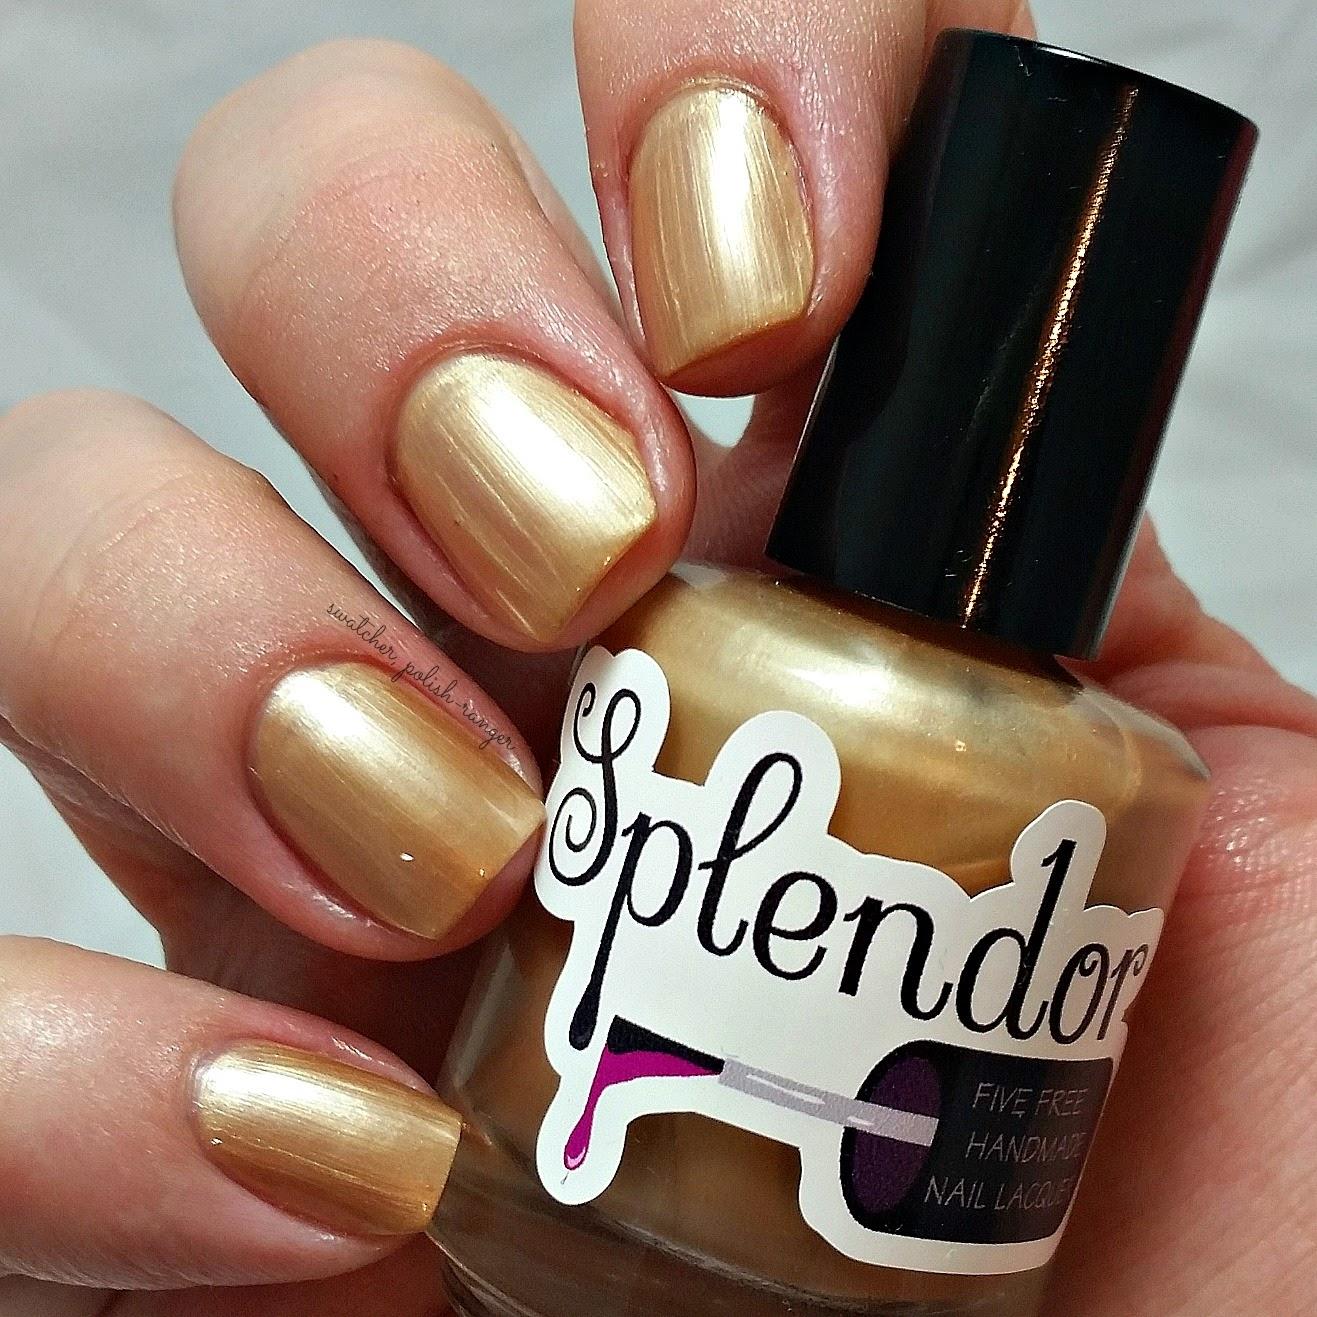 swatcher, polish-ranger | Splendor Nail Lacquer Pudding Sauce swatch